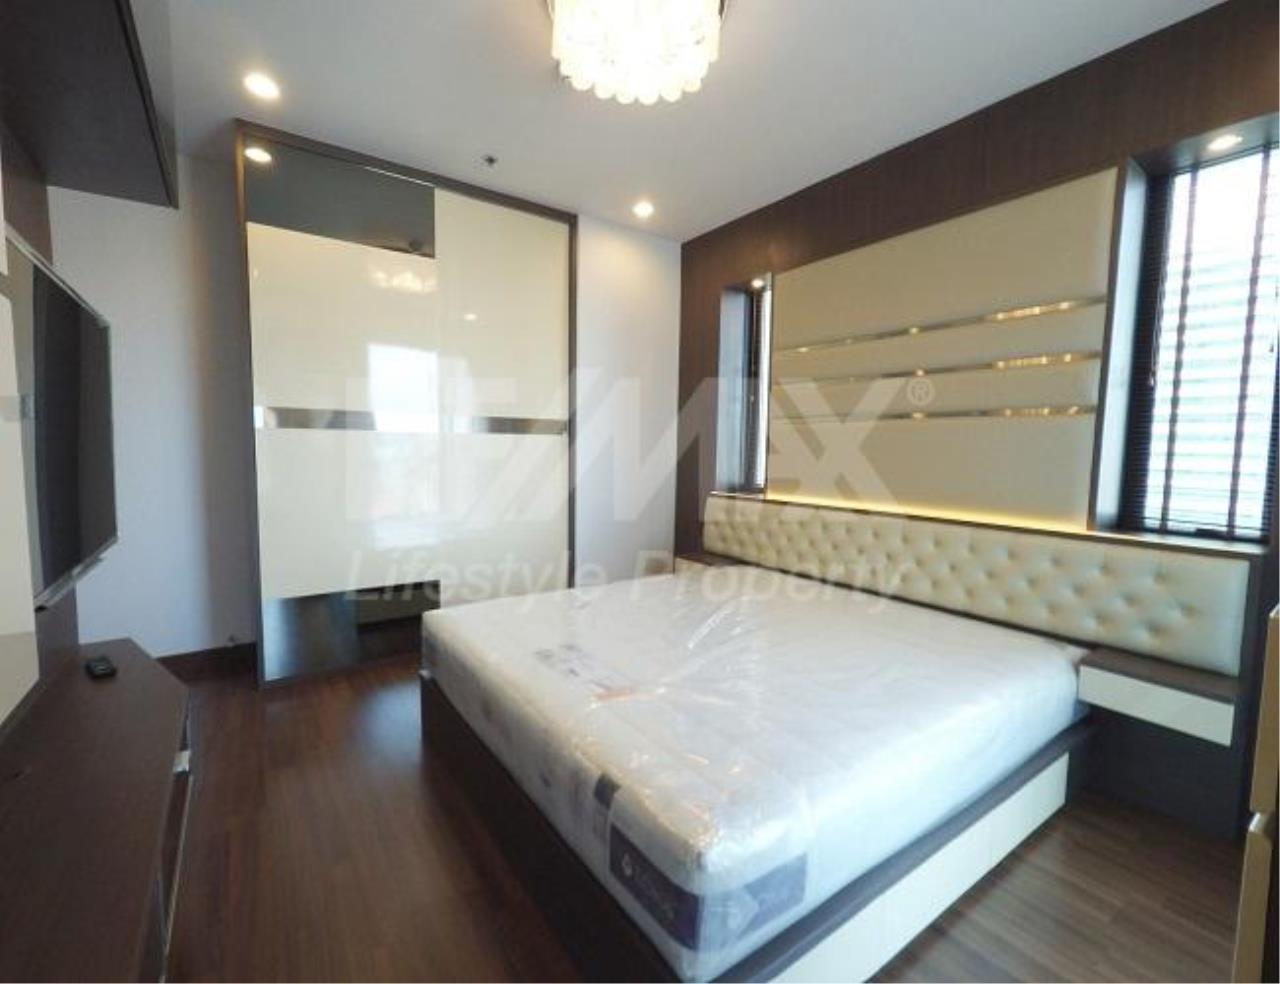 RE/MAX LifeStyle Property Agency's Supalai Premier @ Asoke 6